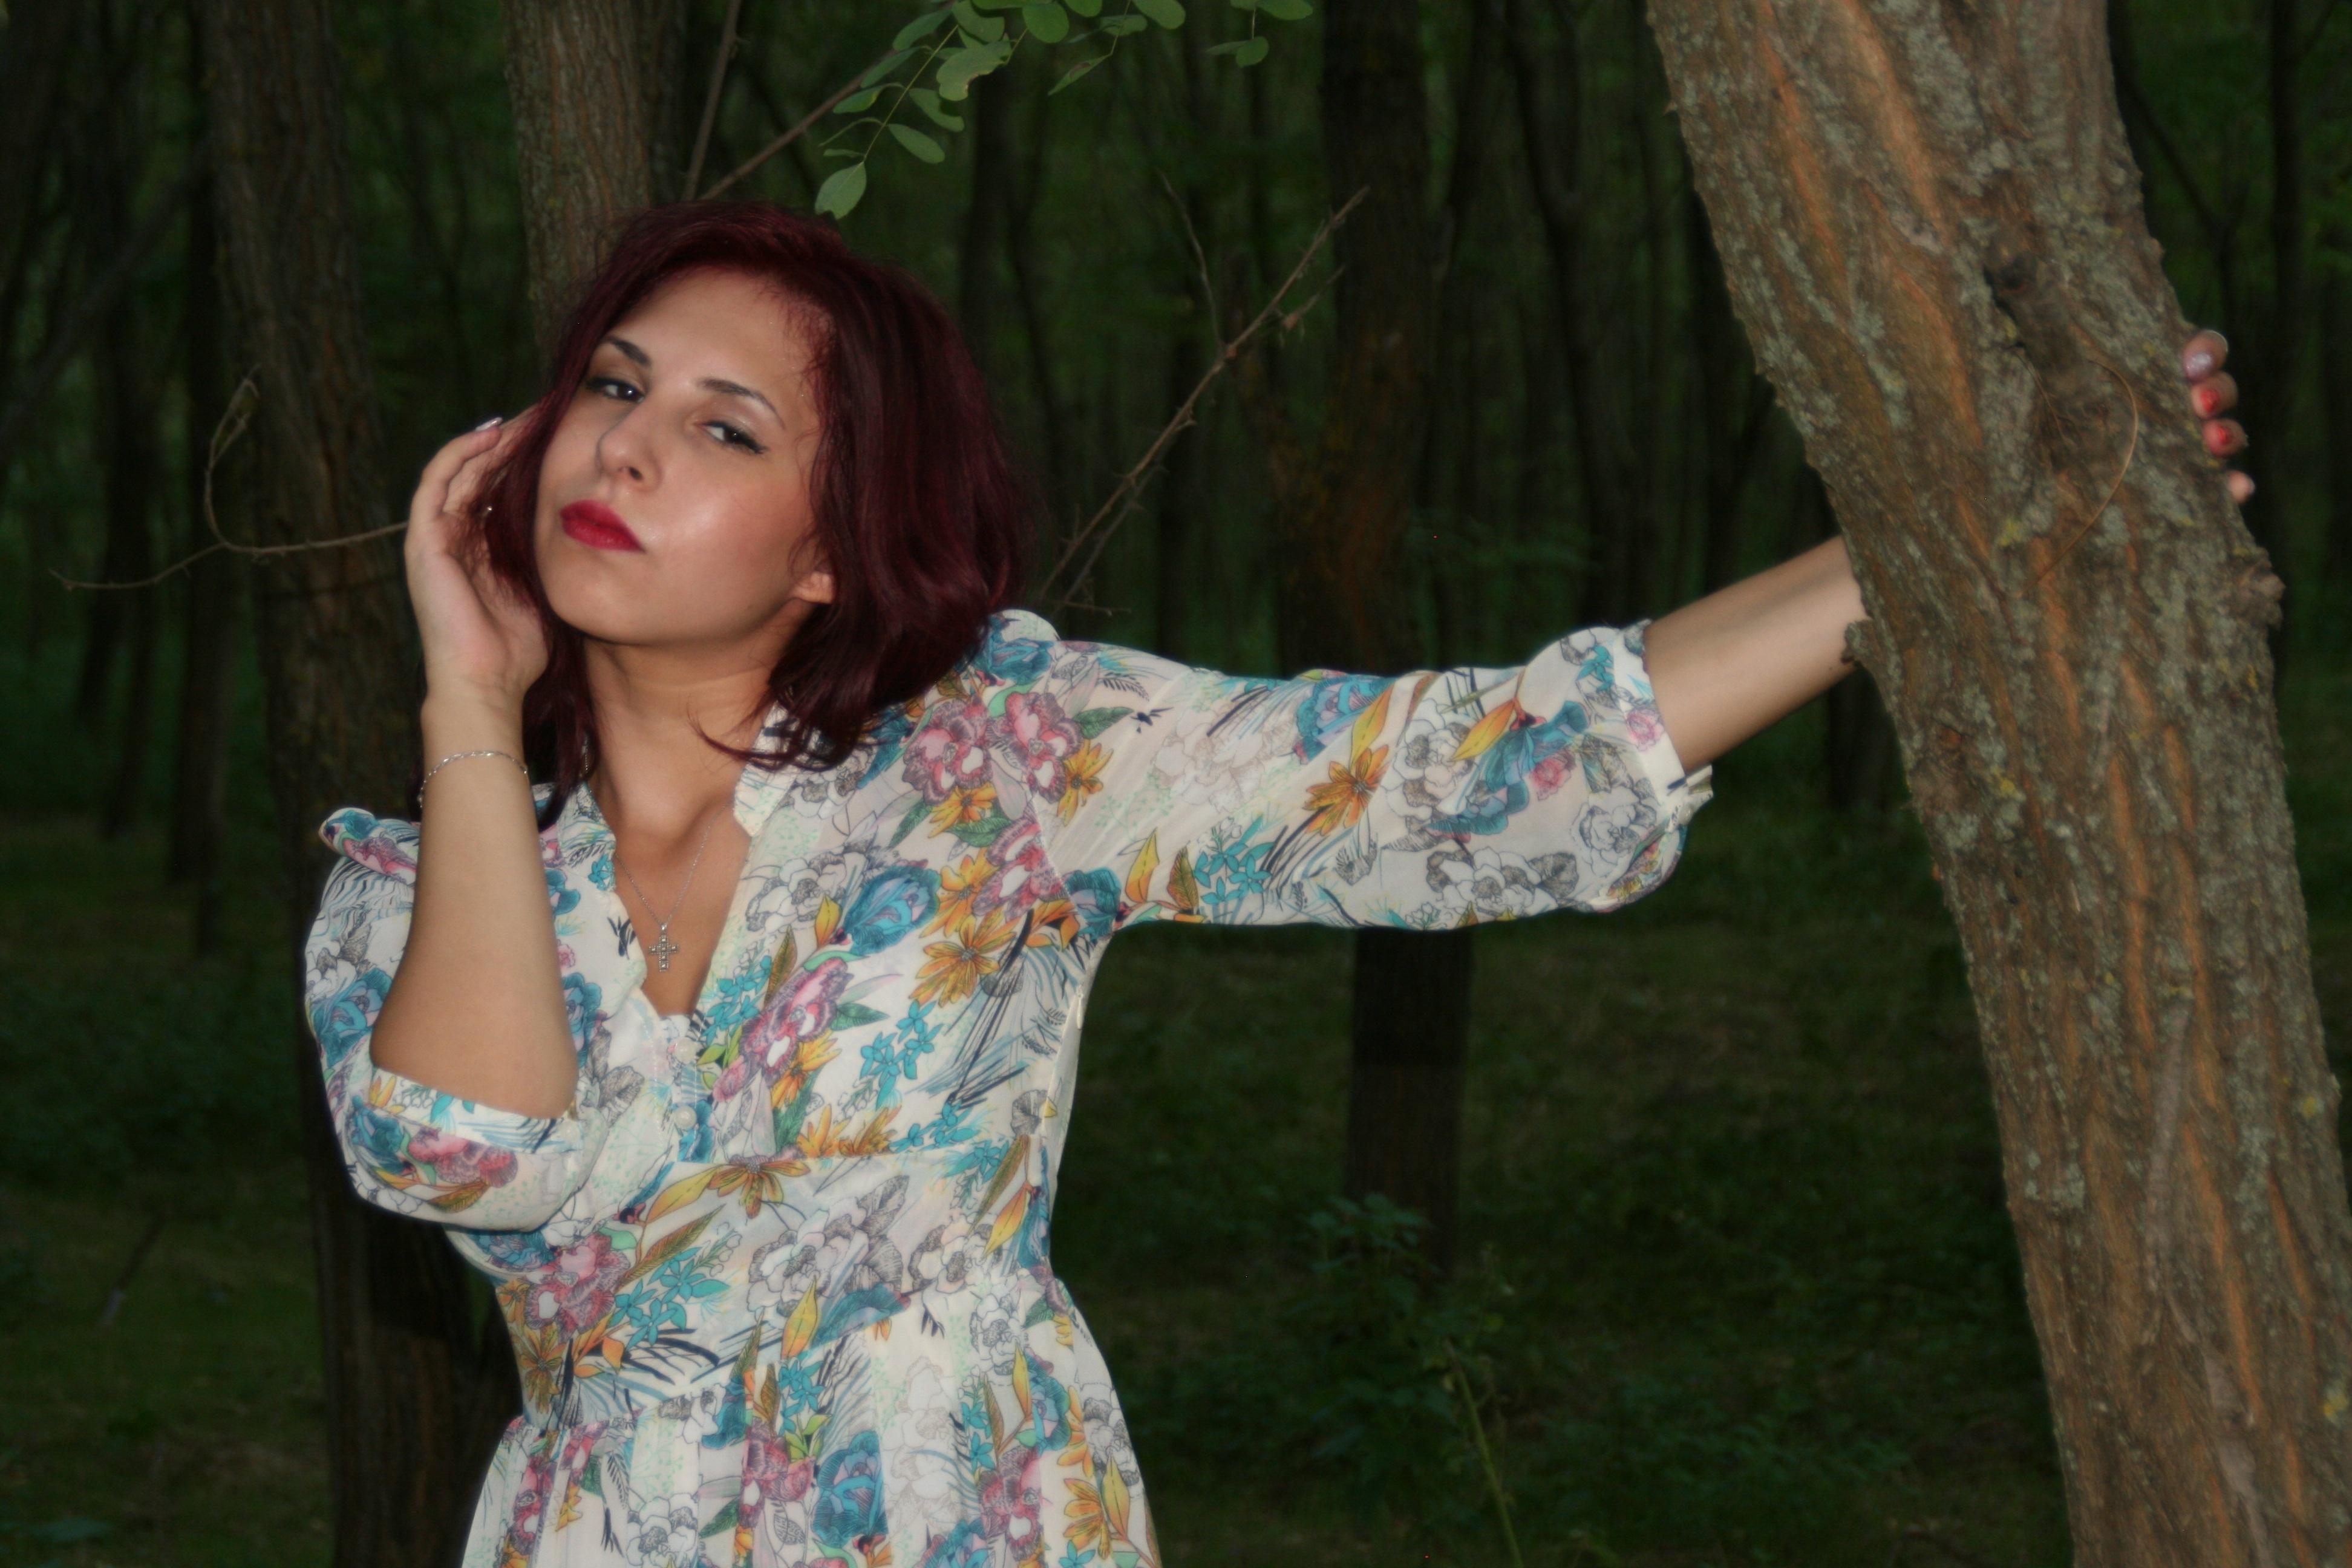 Pose, Tree, Wood, Jungle, Human, HQ Photo